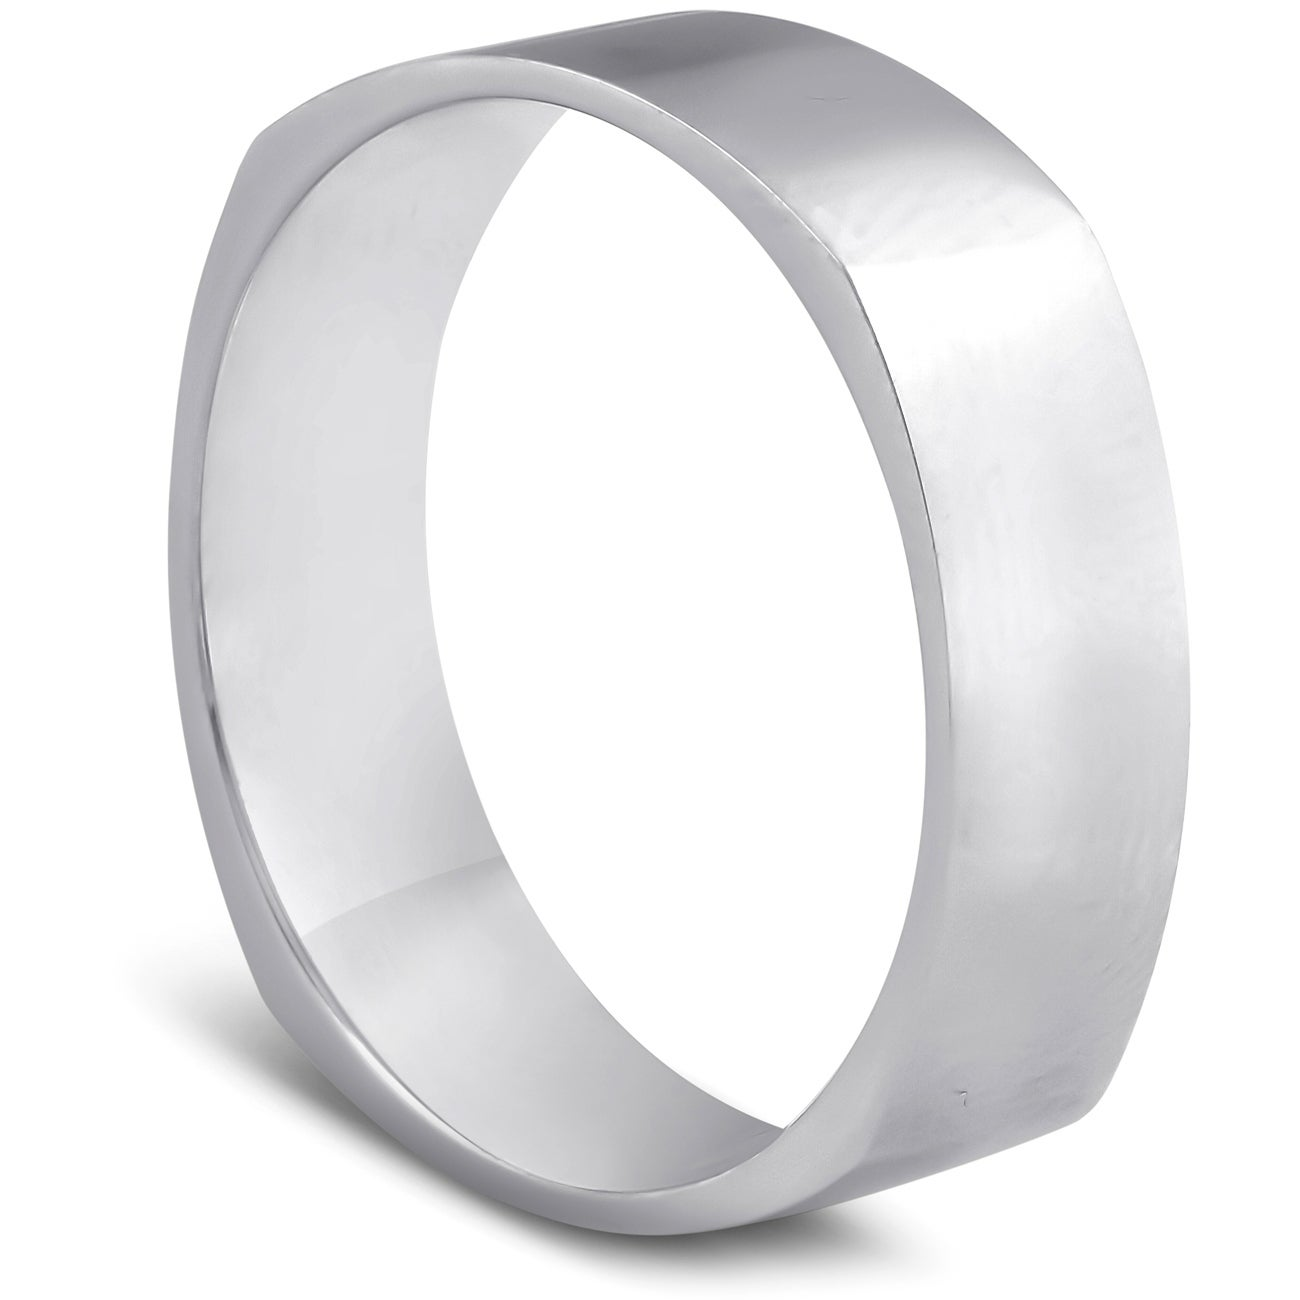 Titanium 6mm Flat Polished Comfort Fit Wedding Band Ring